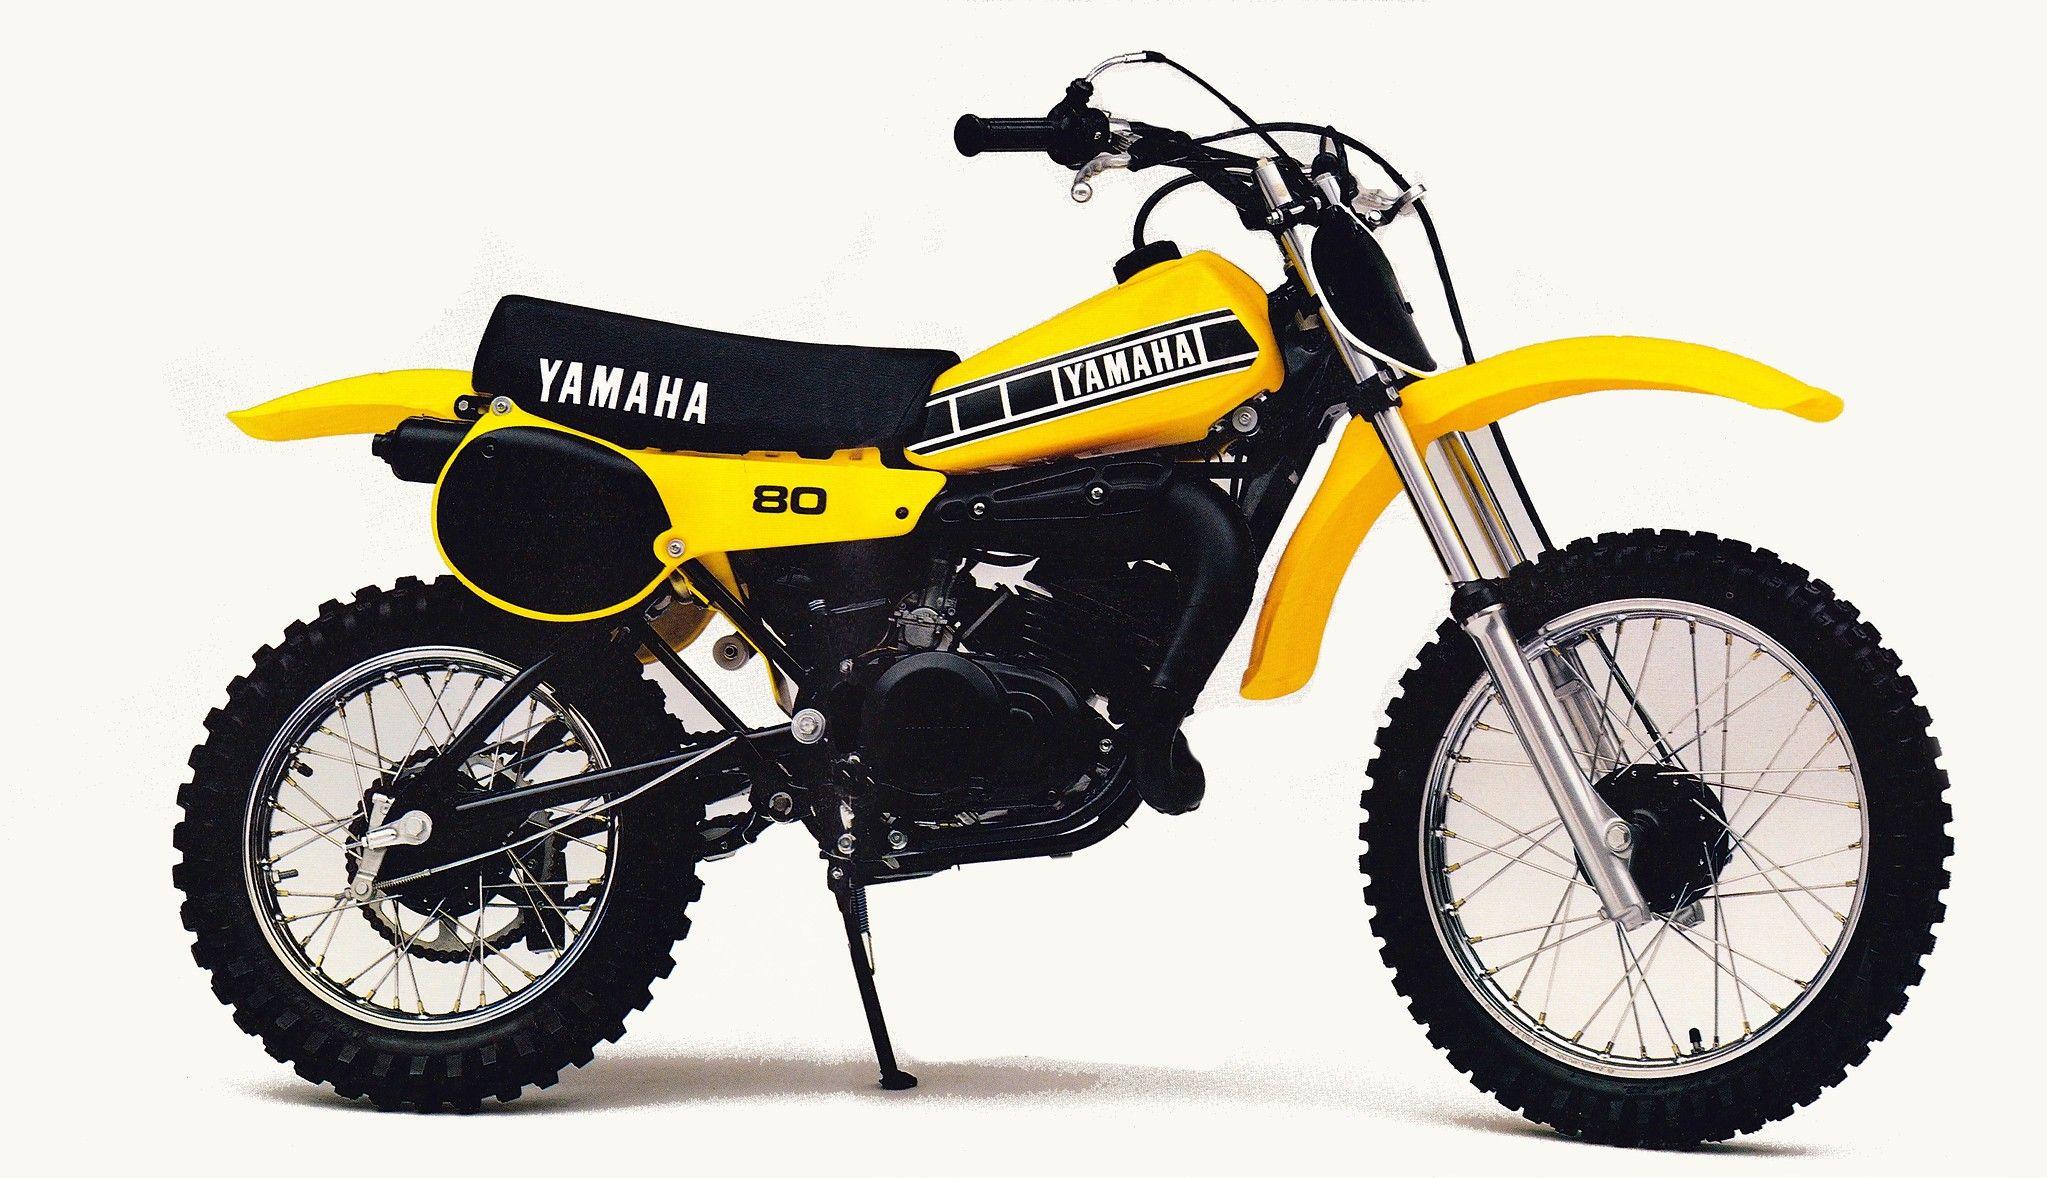 1980 Yamaha Yz80 In 2020 Yamaha Dirt Bikes For Kids Cool Dirt Bikes